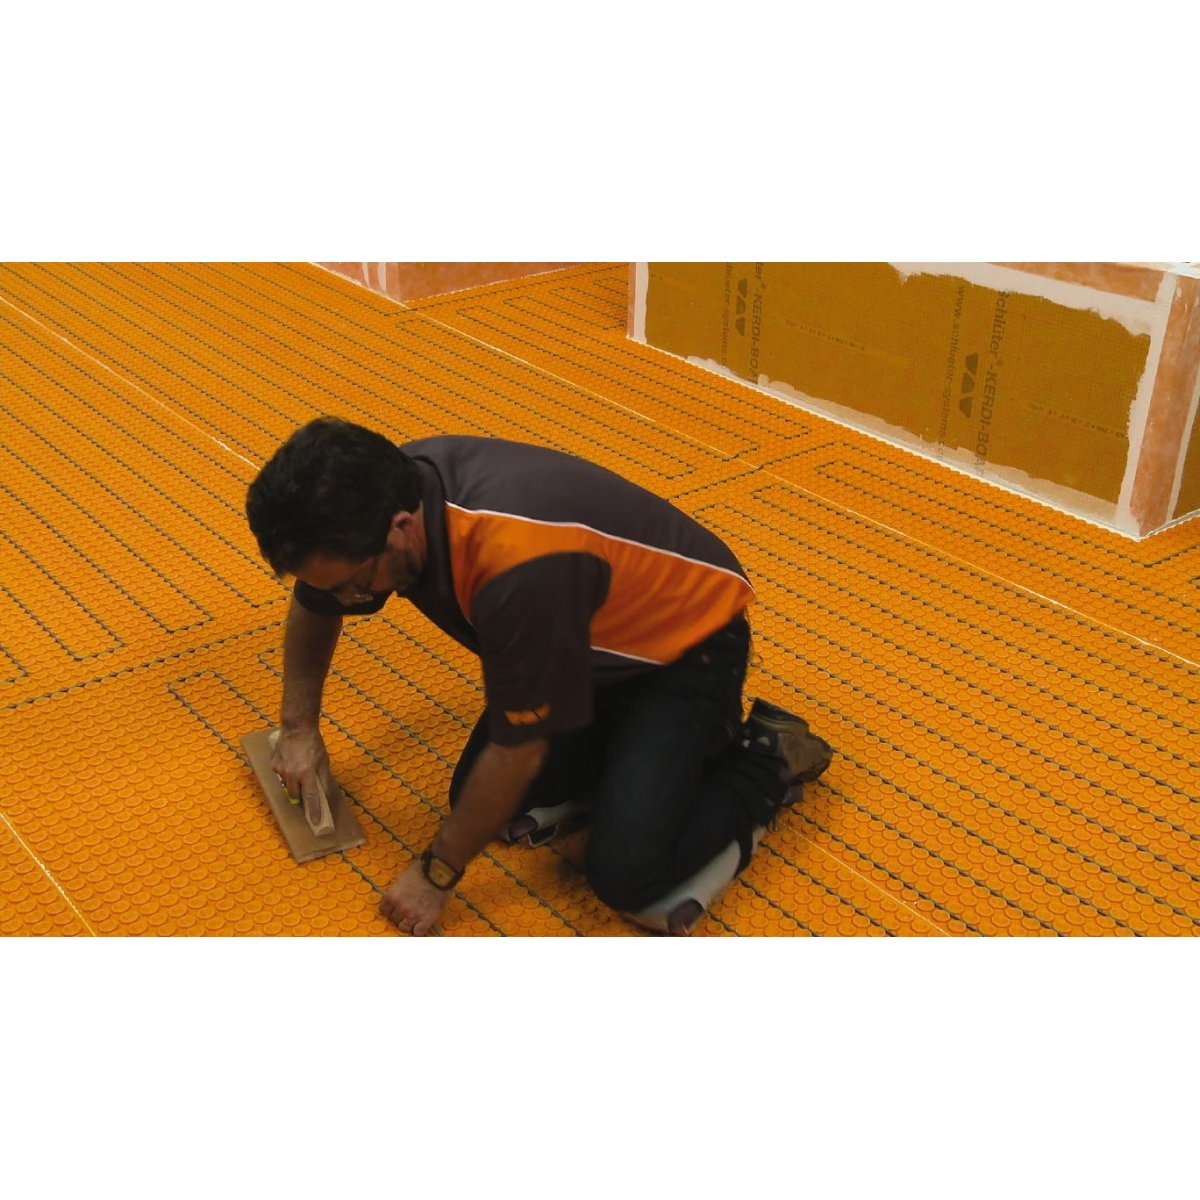 Kit de suelo radiante con termostato táctil Suelo radiante eléctrico